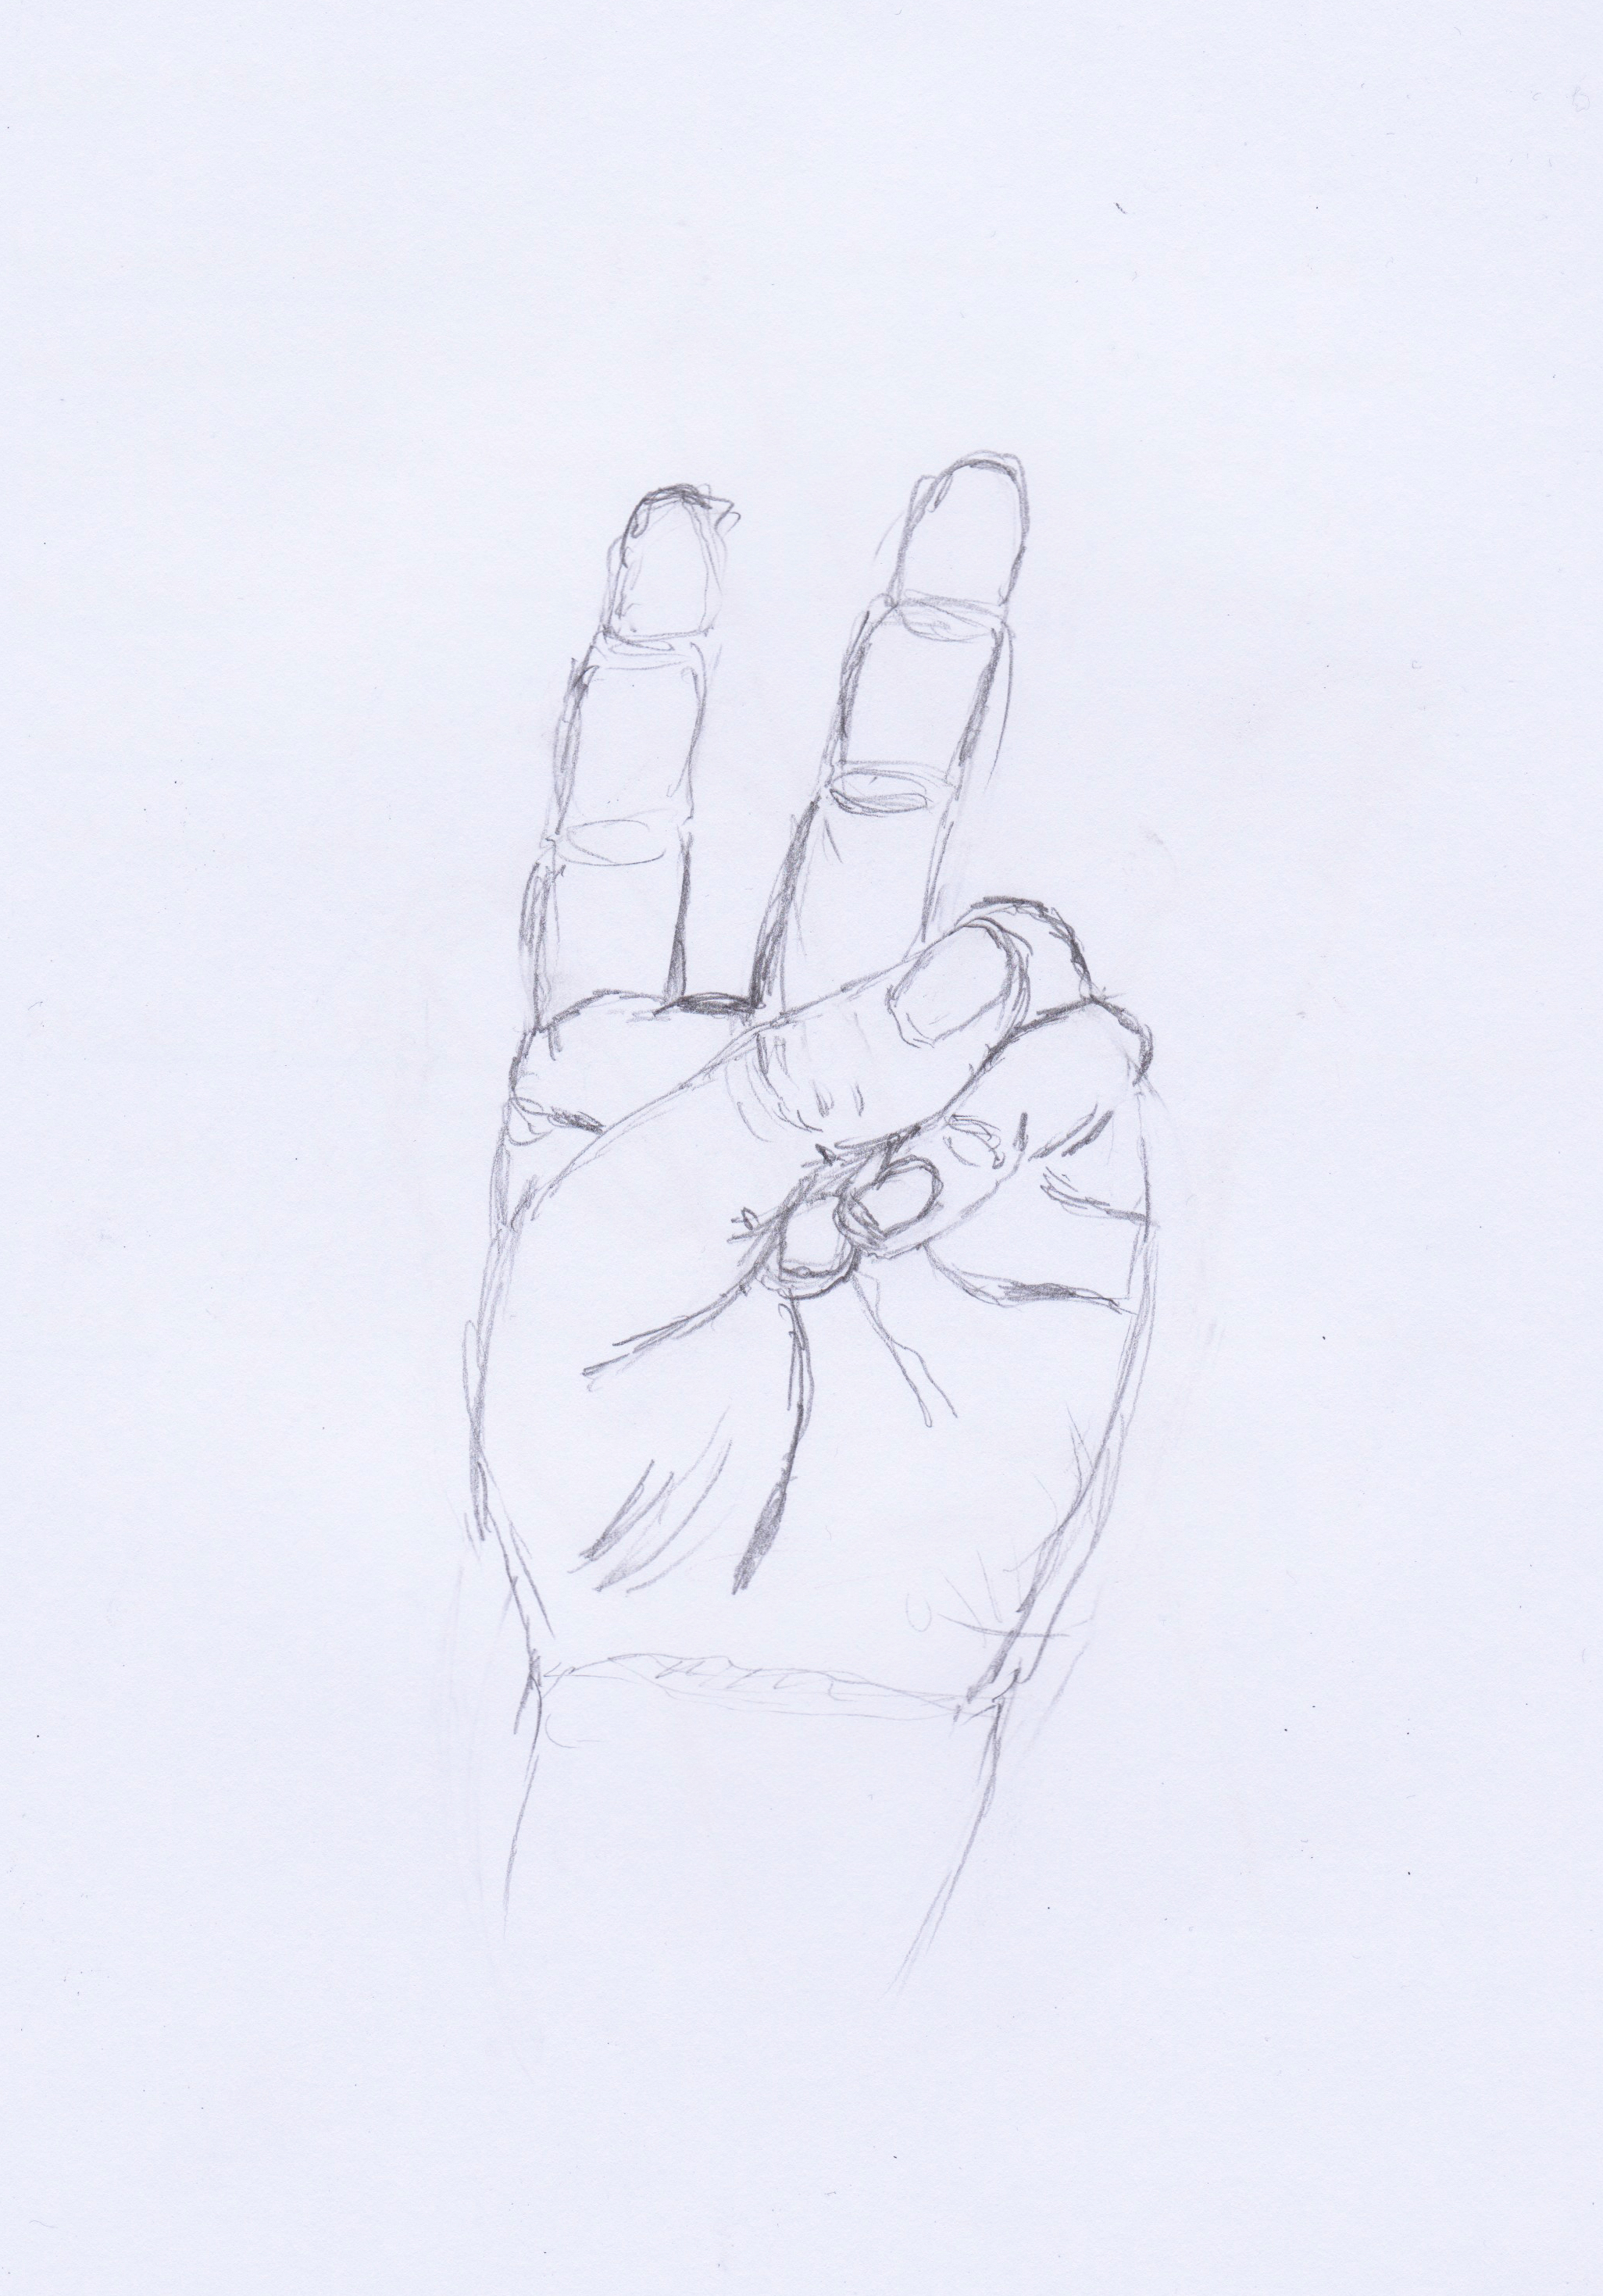 Sketch Amp Draw 1